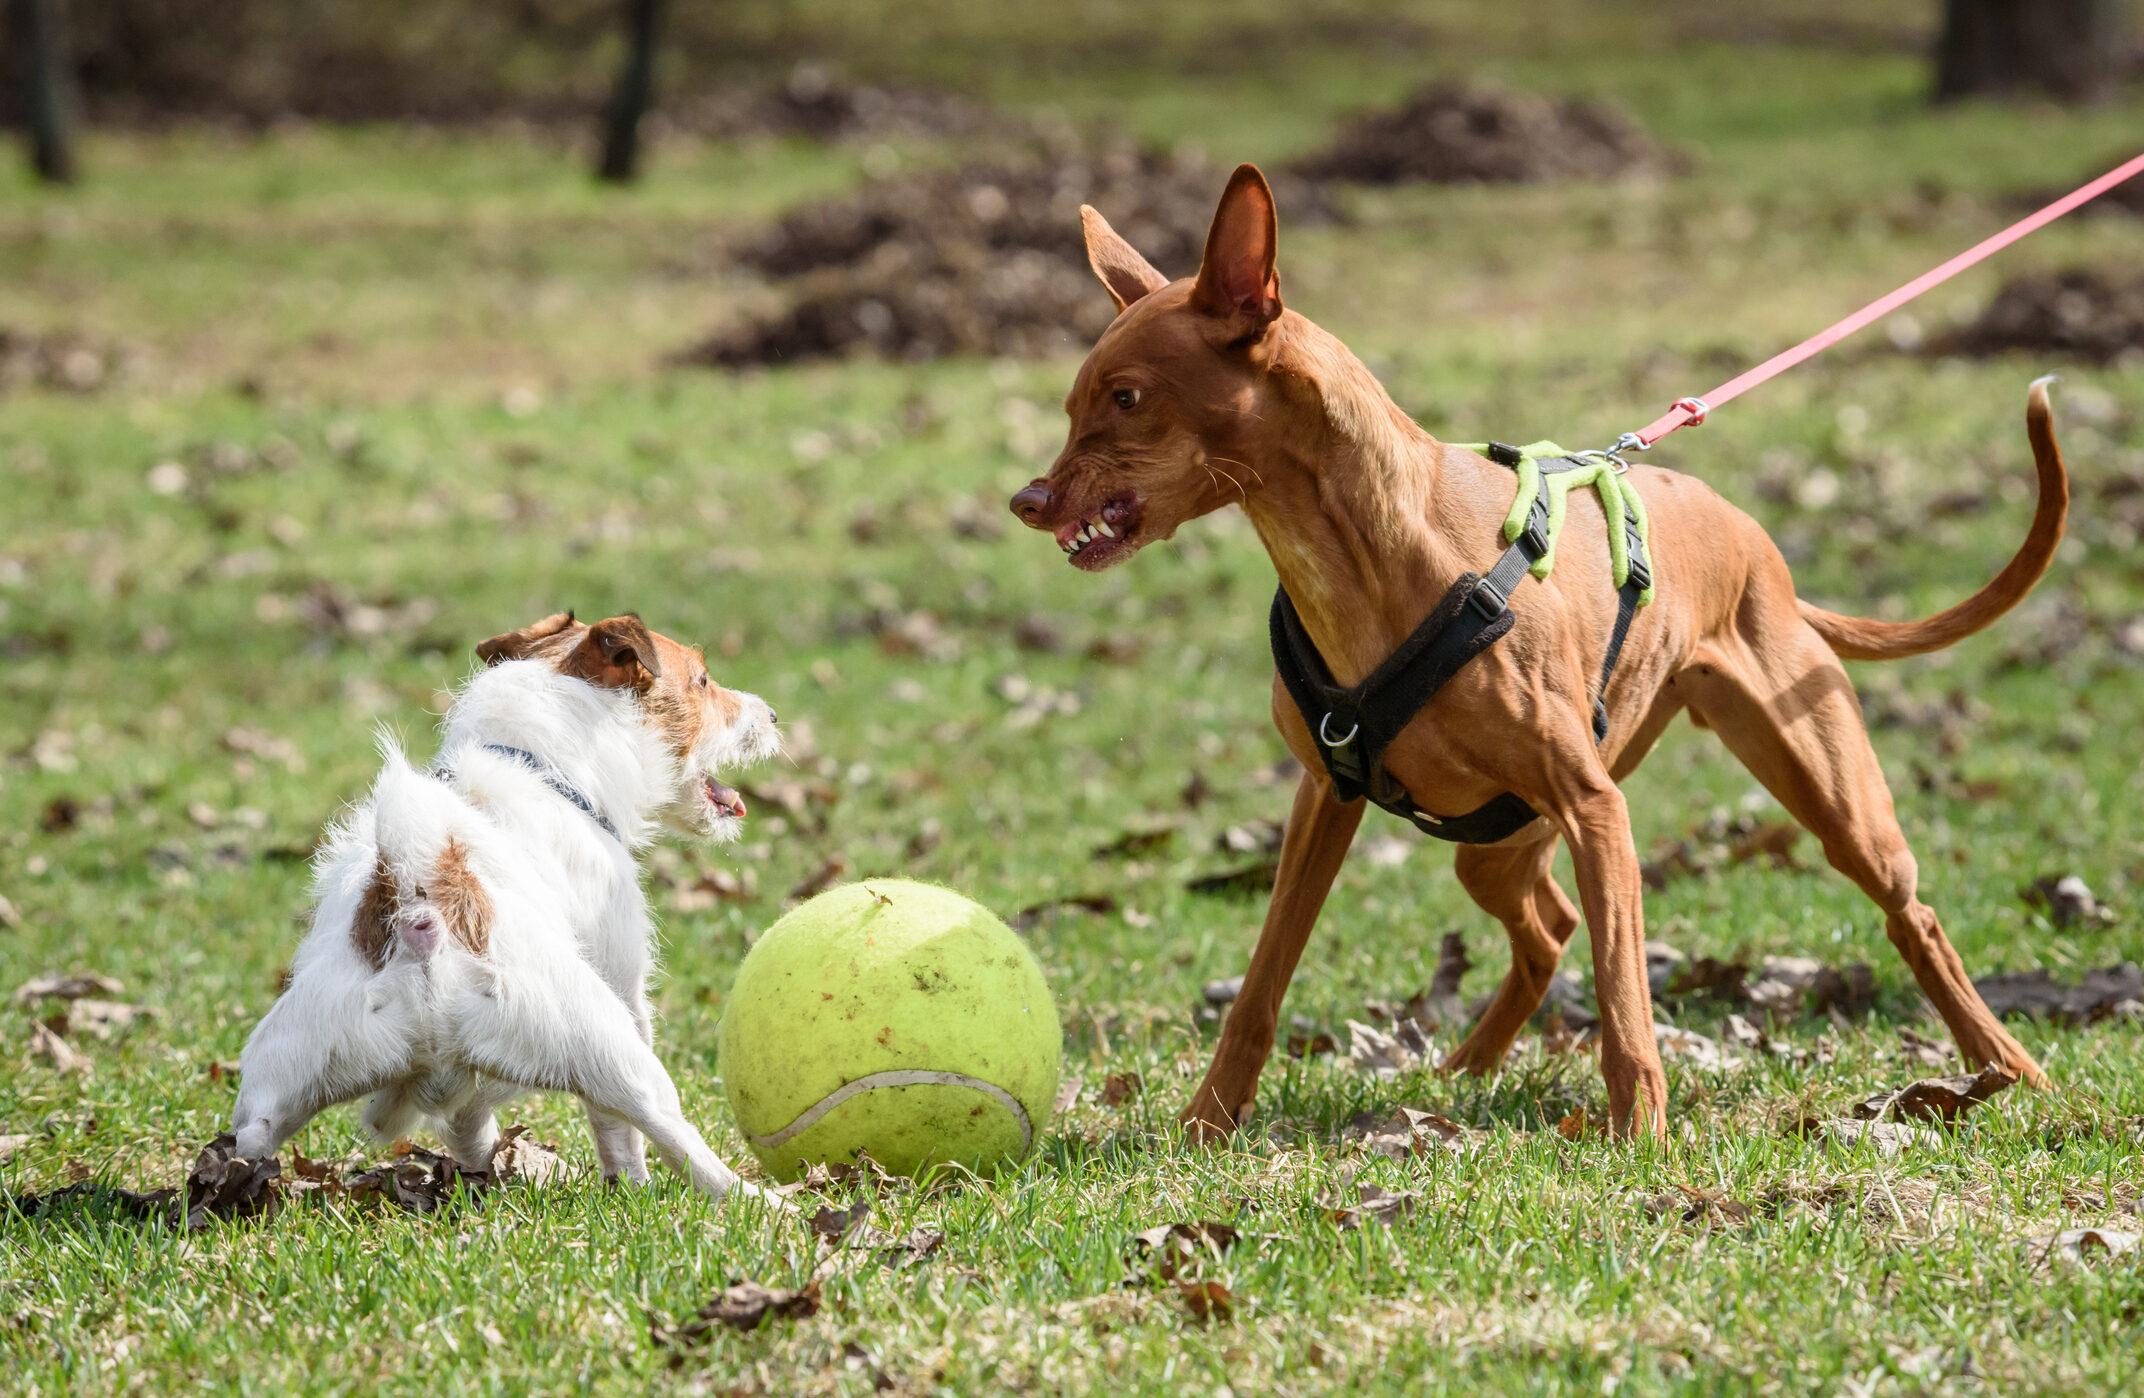 Best Way To Correct Dog Behavior